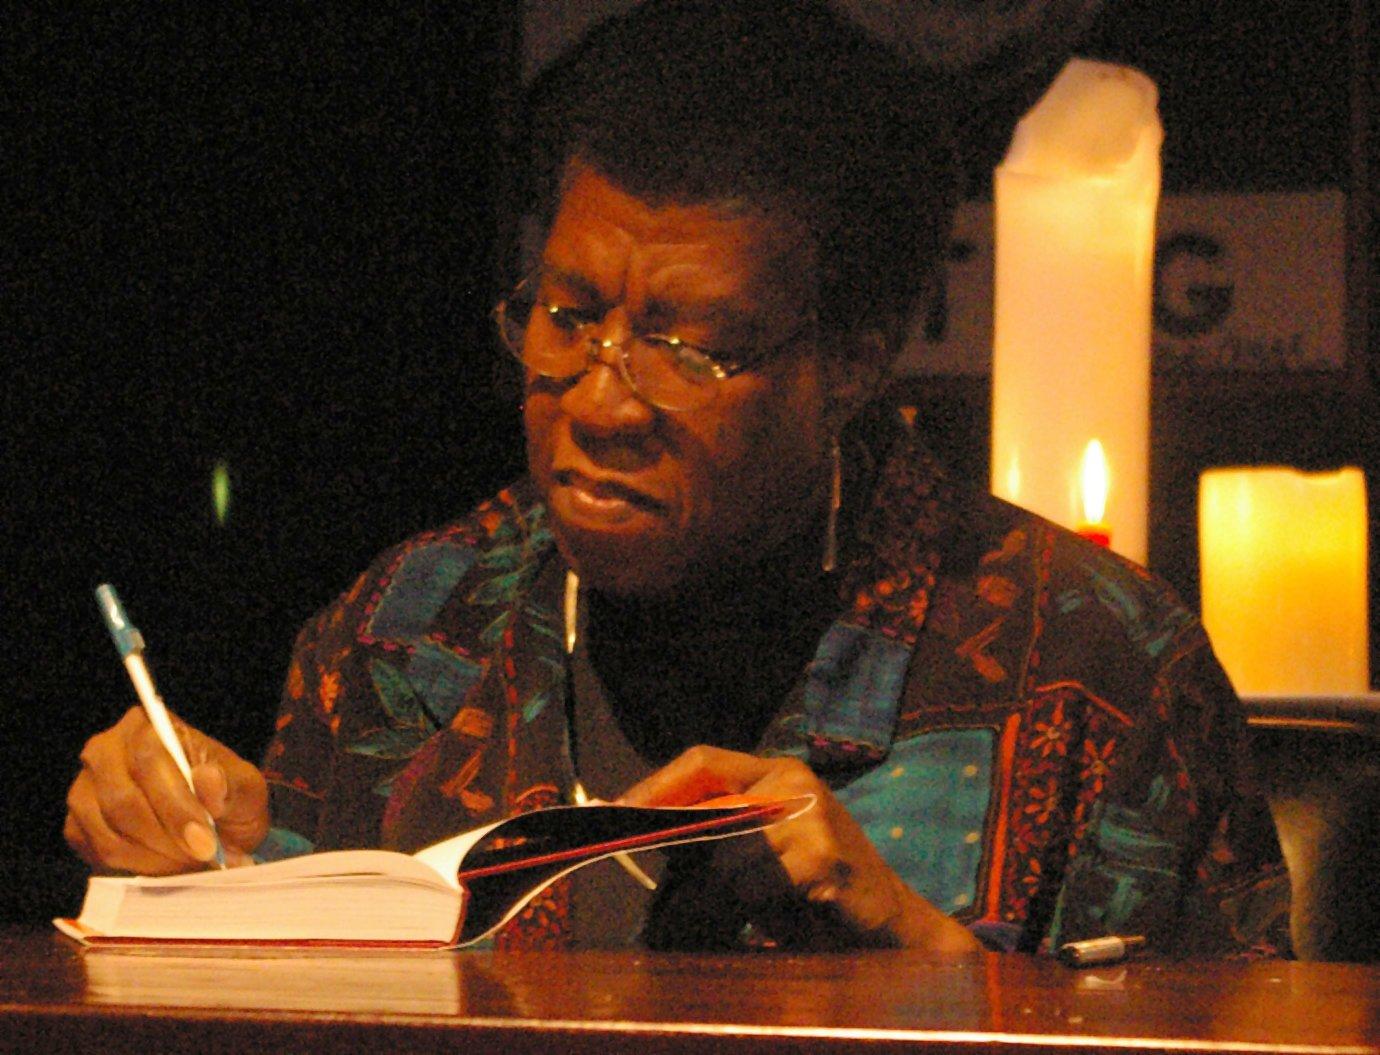 Octavia E. Butler signing a copy of her book  Fledgling.  Photo credit: Nikolas Coukouma